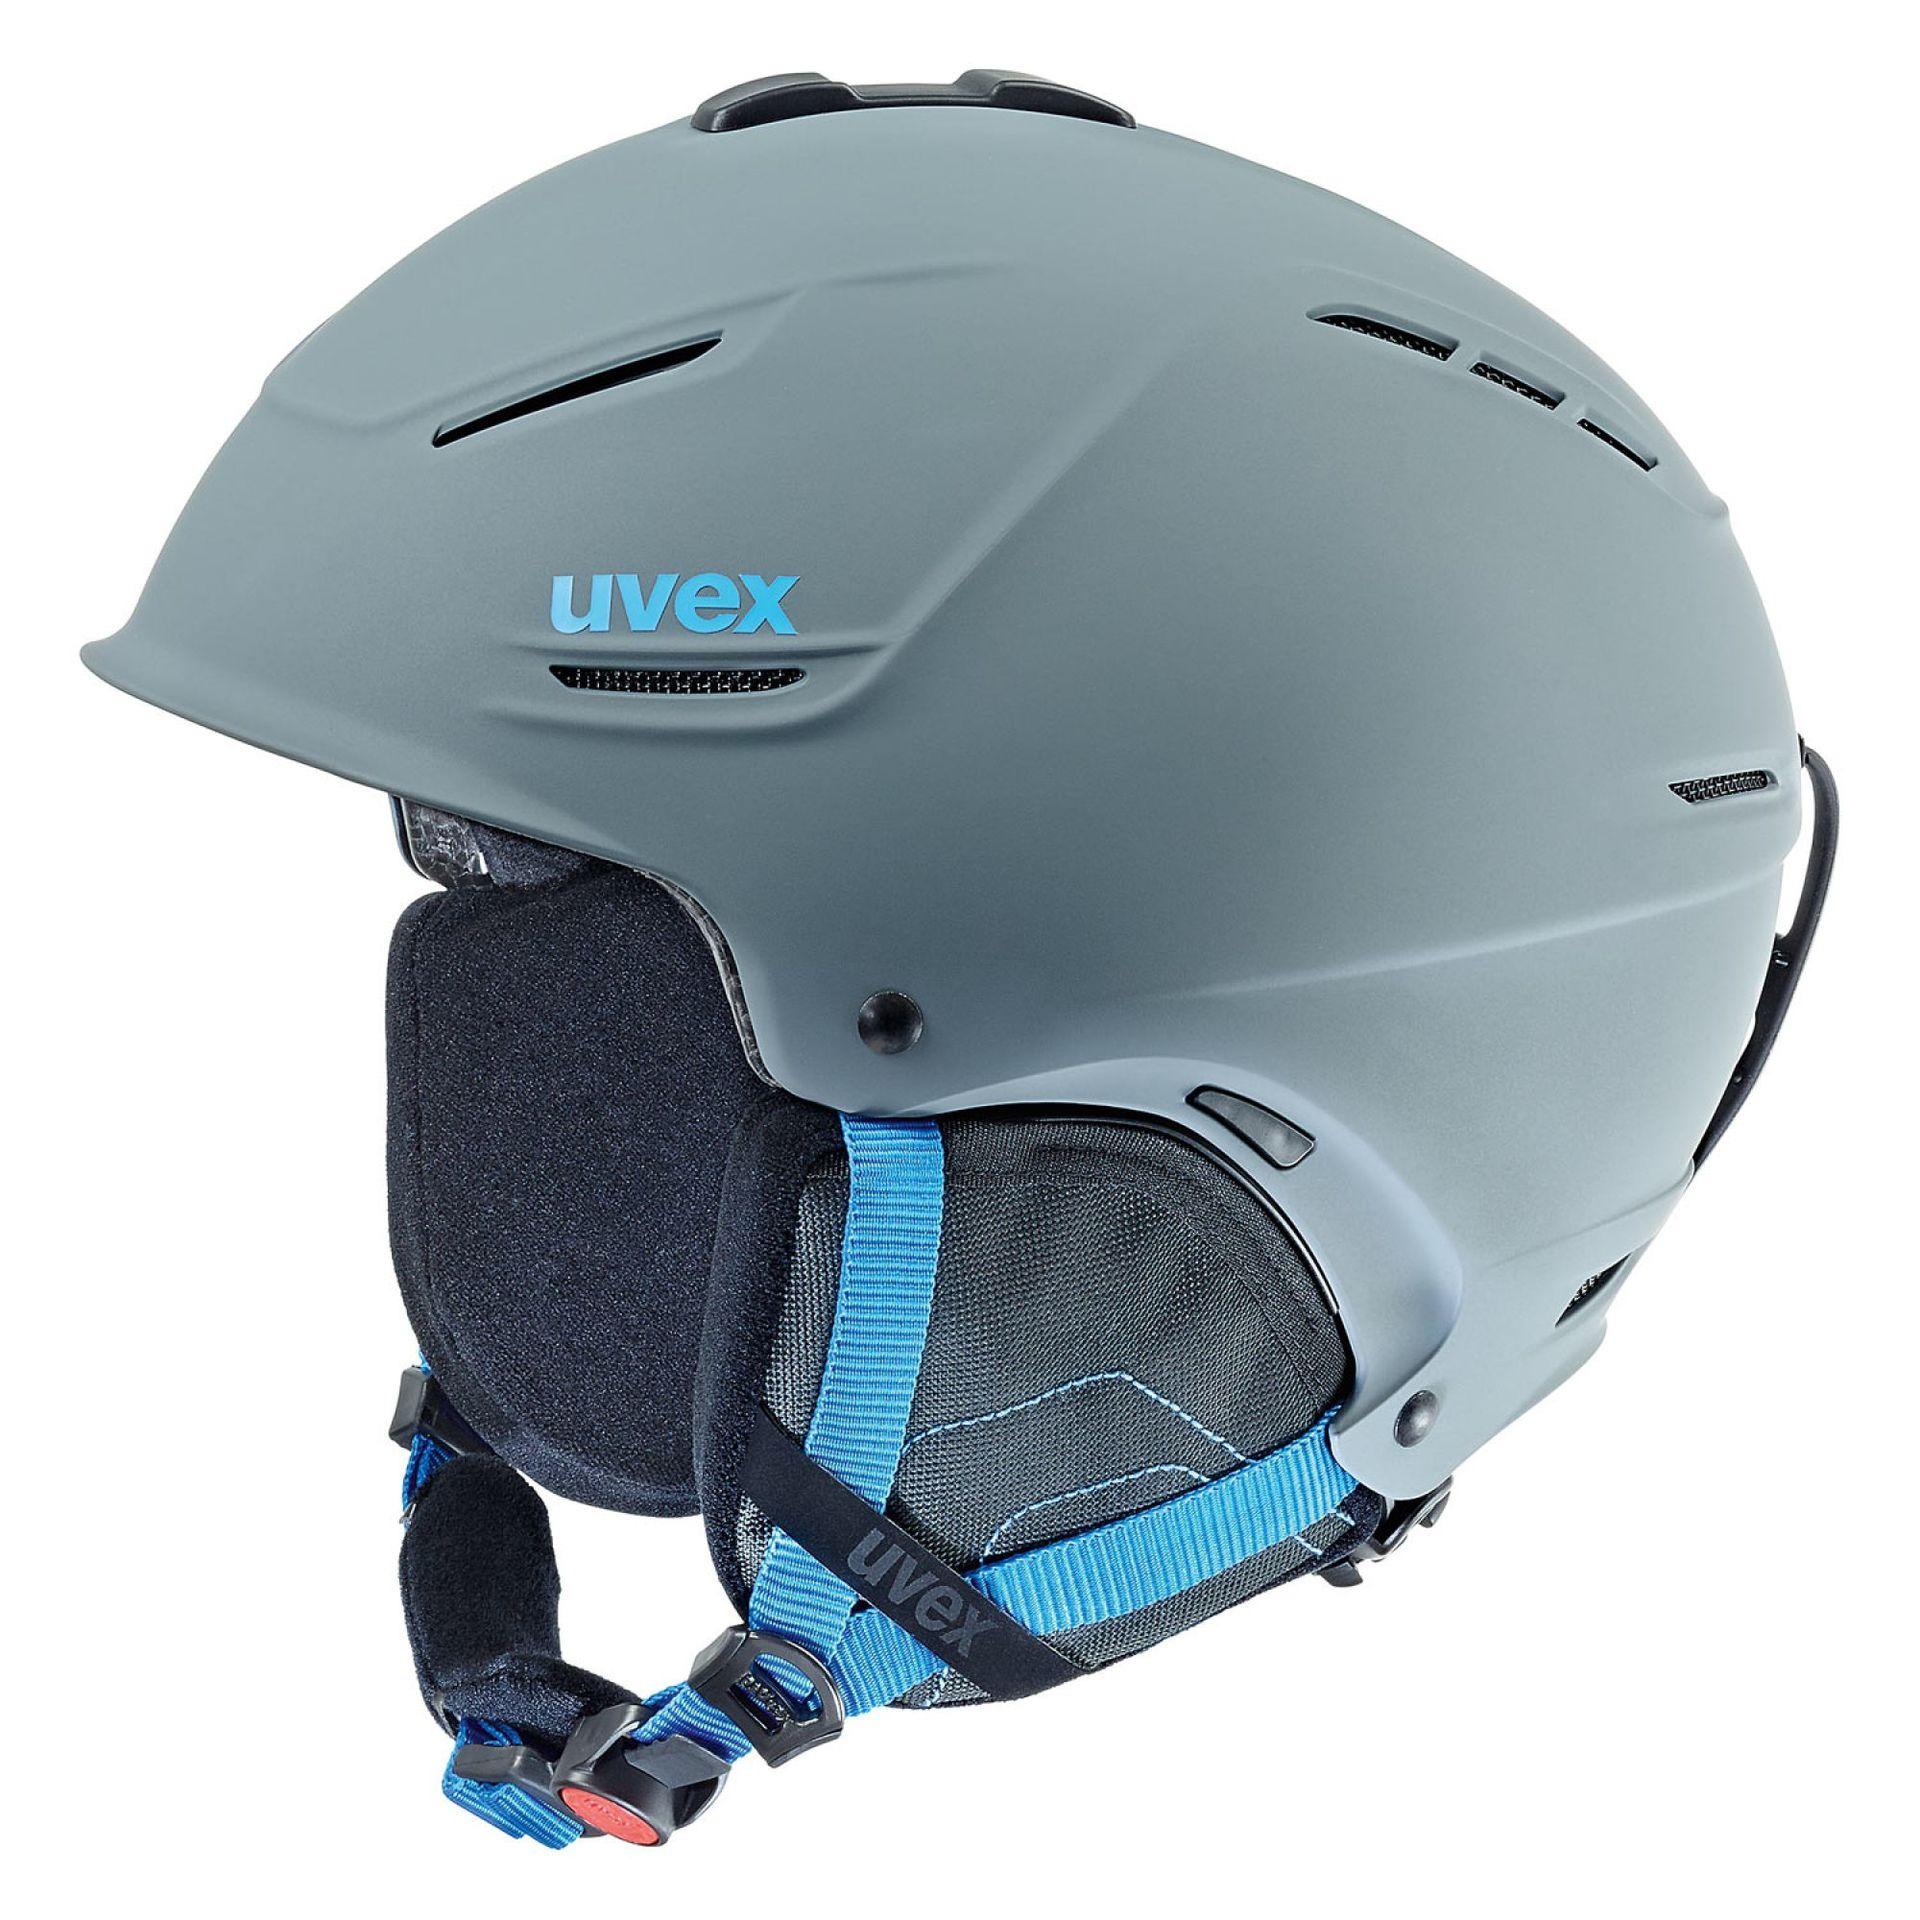 KASK UVEX P1US GREY BLUE MAT